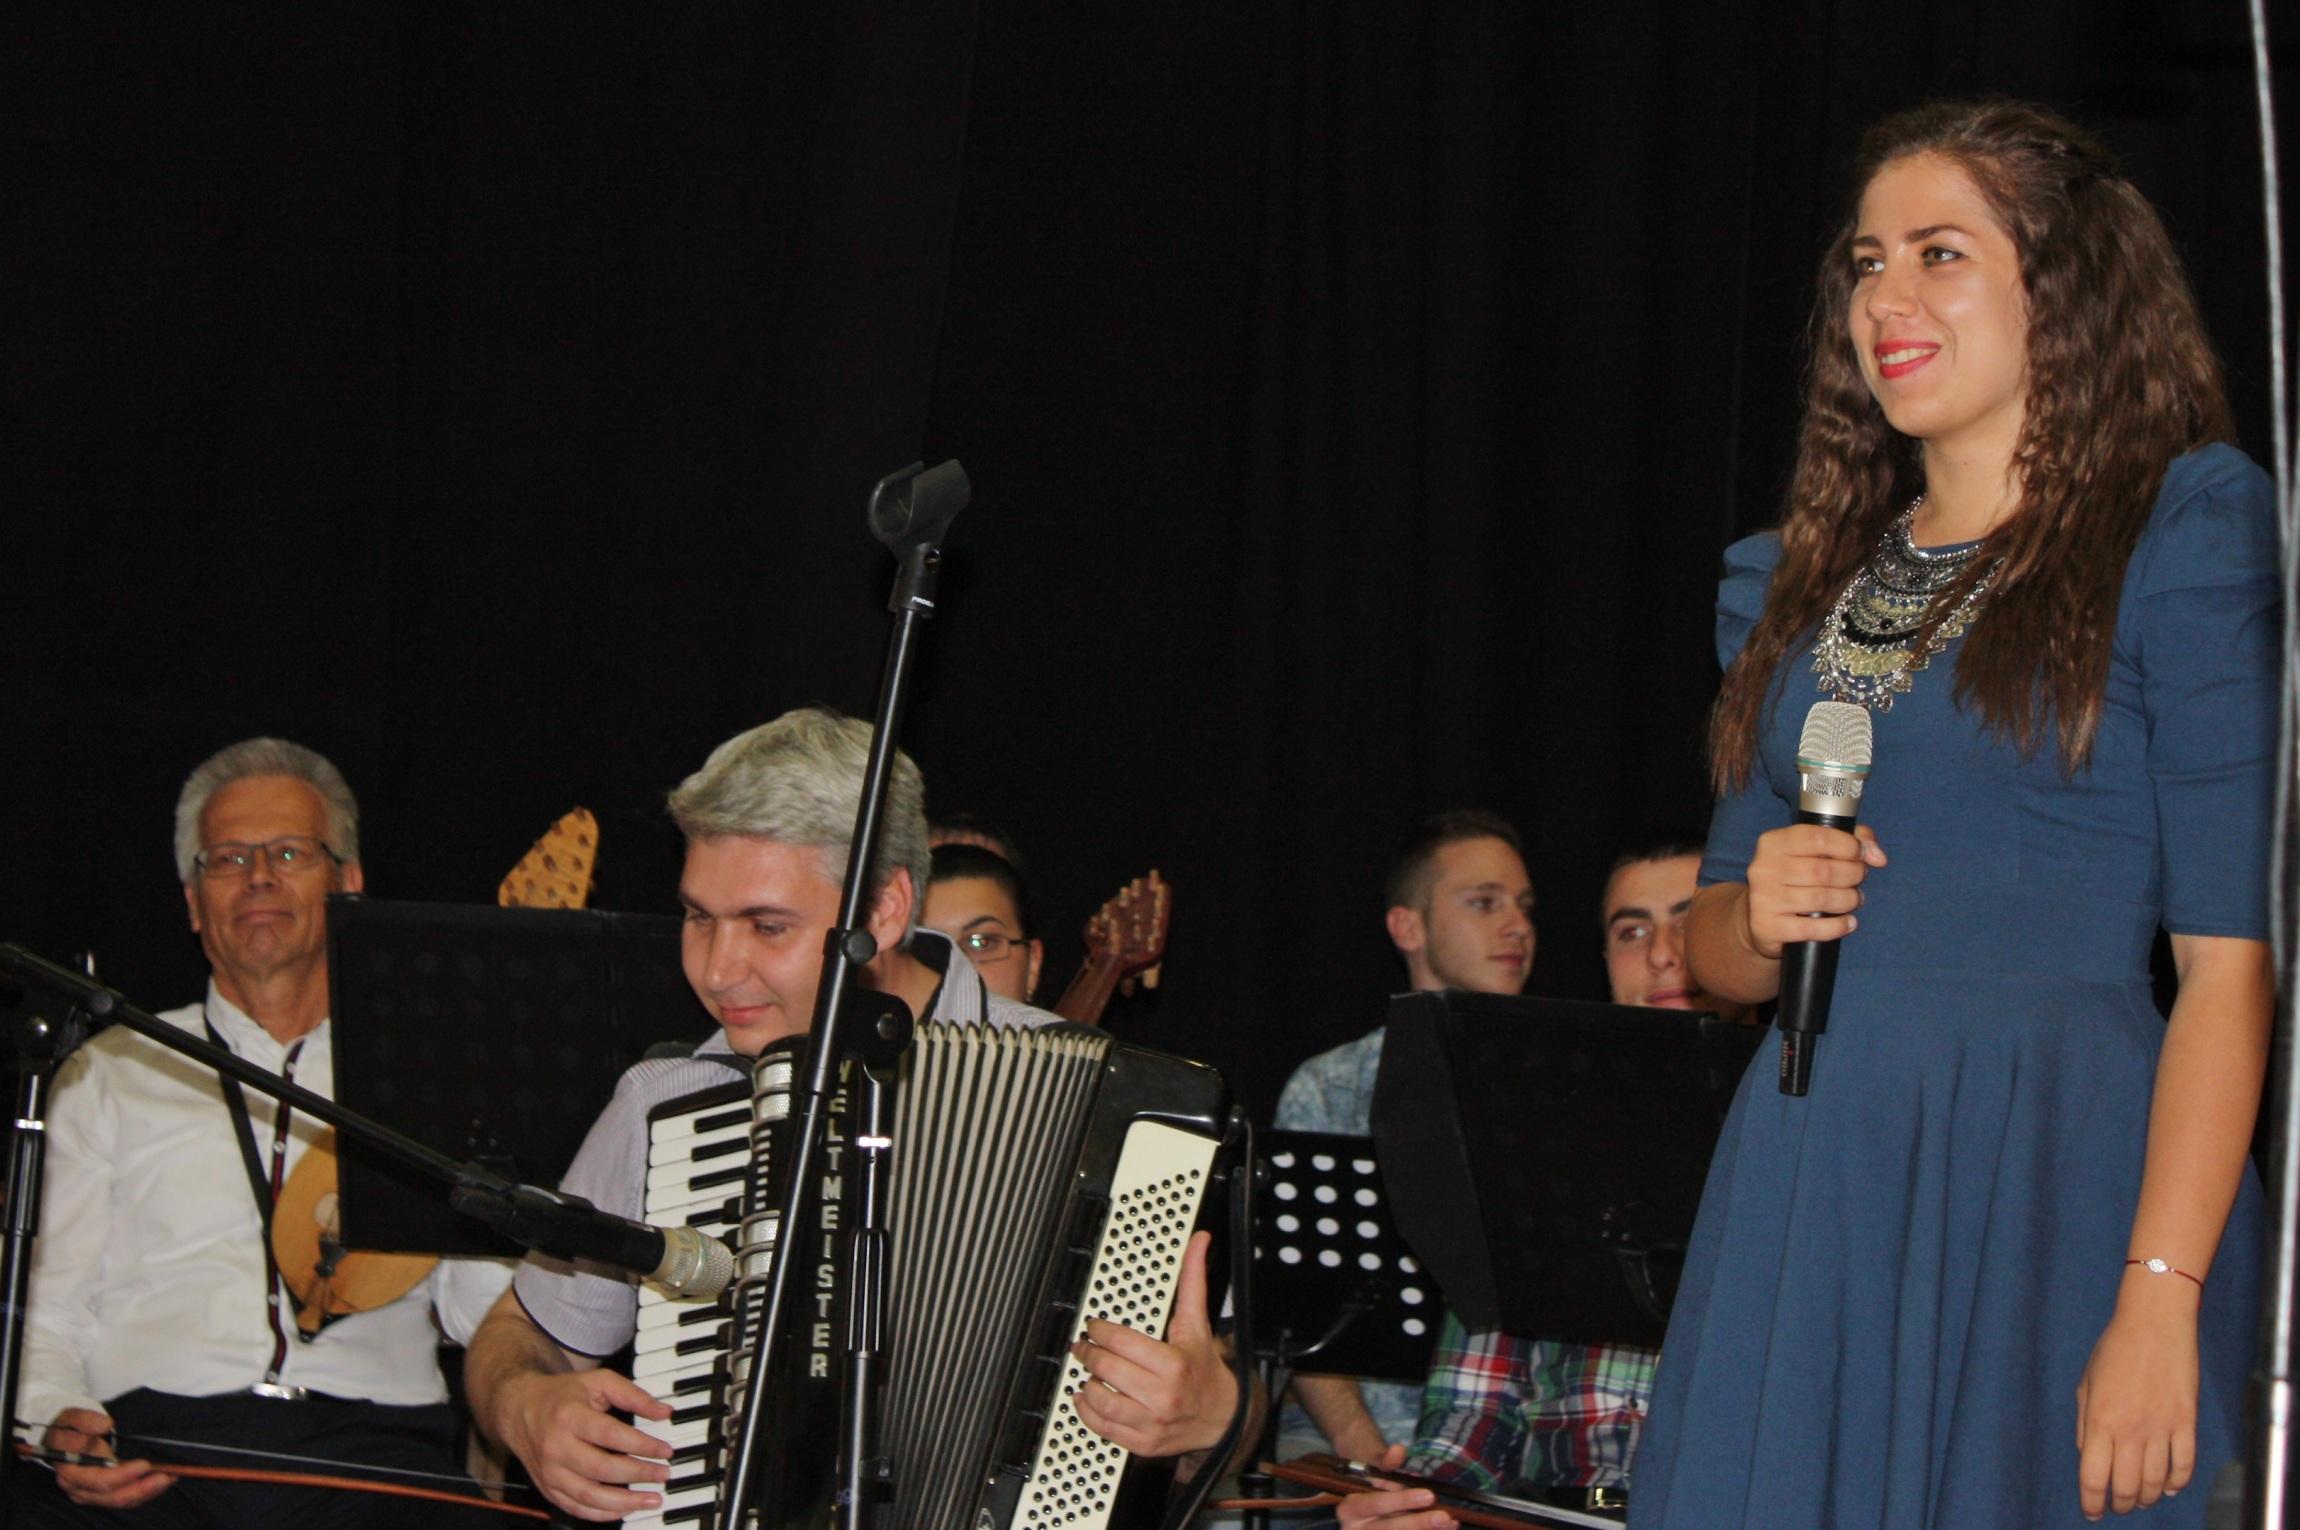 Diiana Vasileva